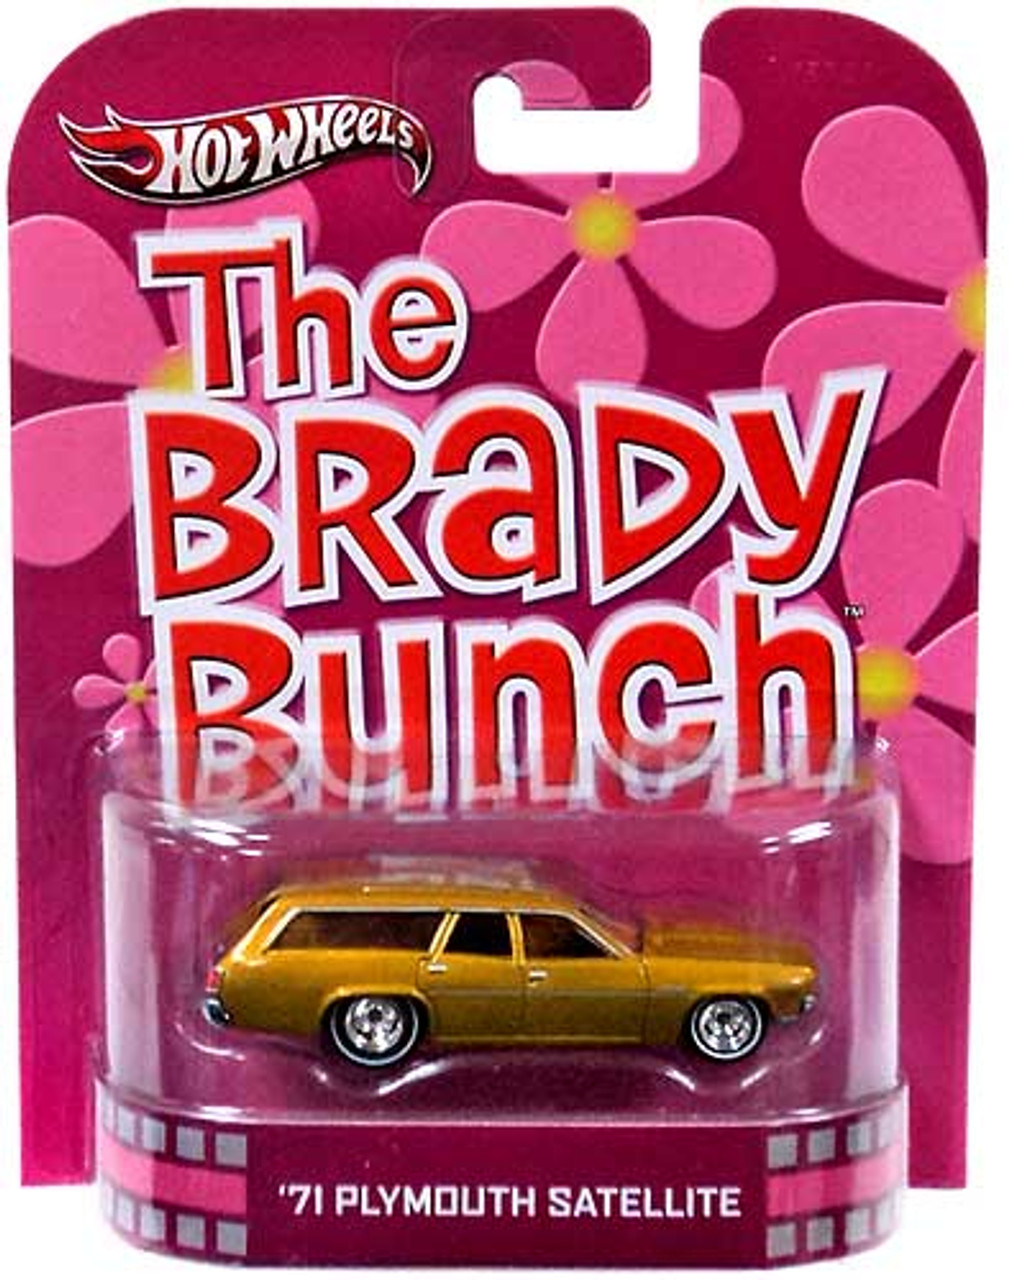 The Brady Bunch Hot Wheels Retro '71 Plymouth Satellite Diecast Vehicle